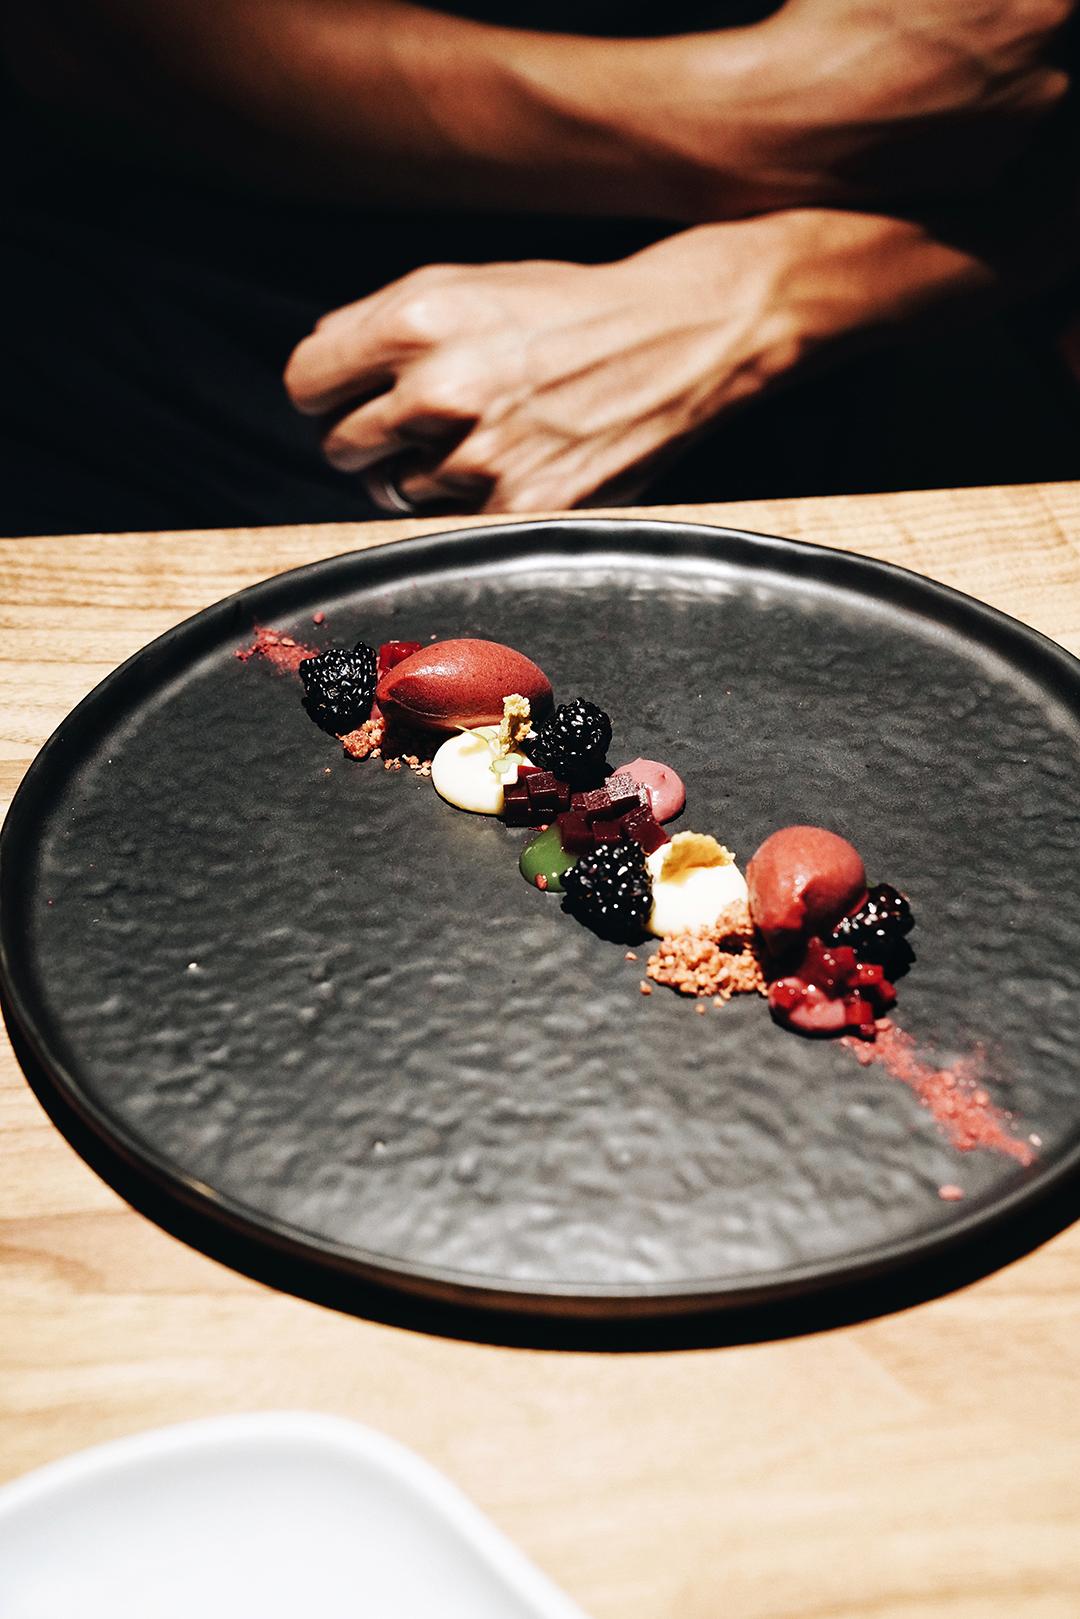 Blackberry textures and celery